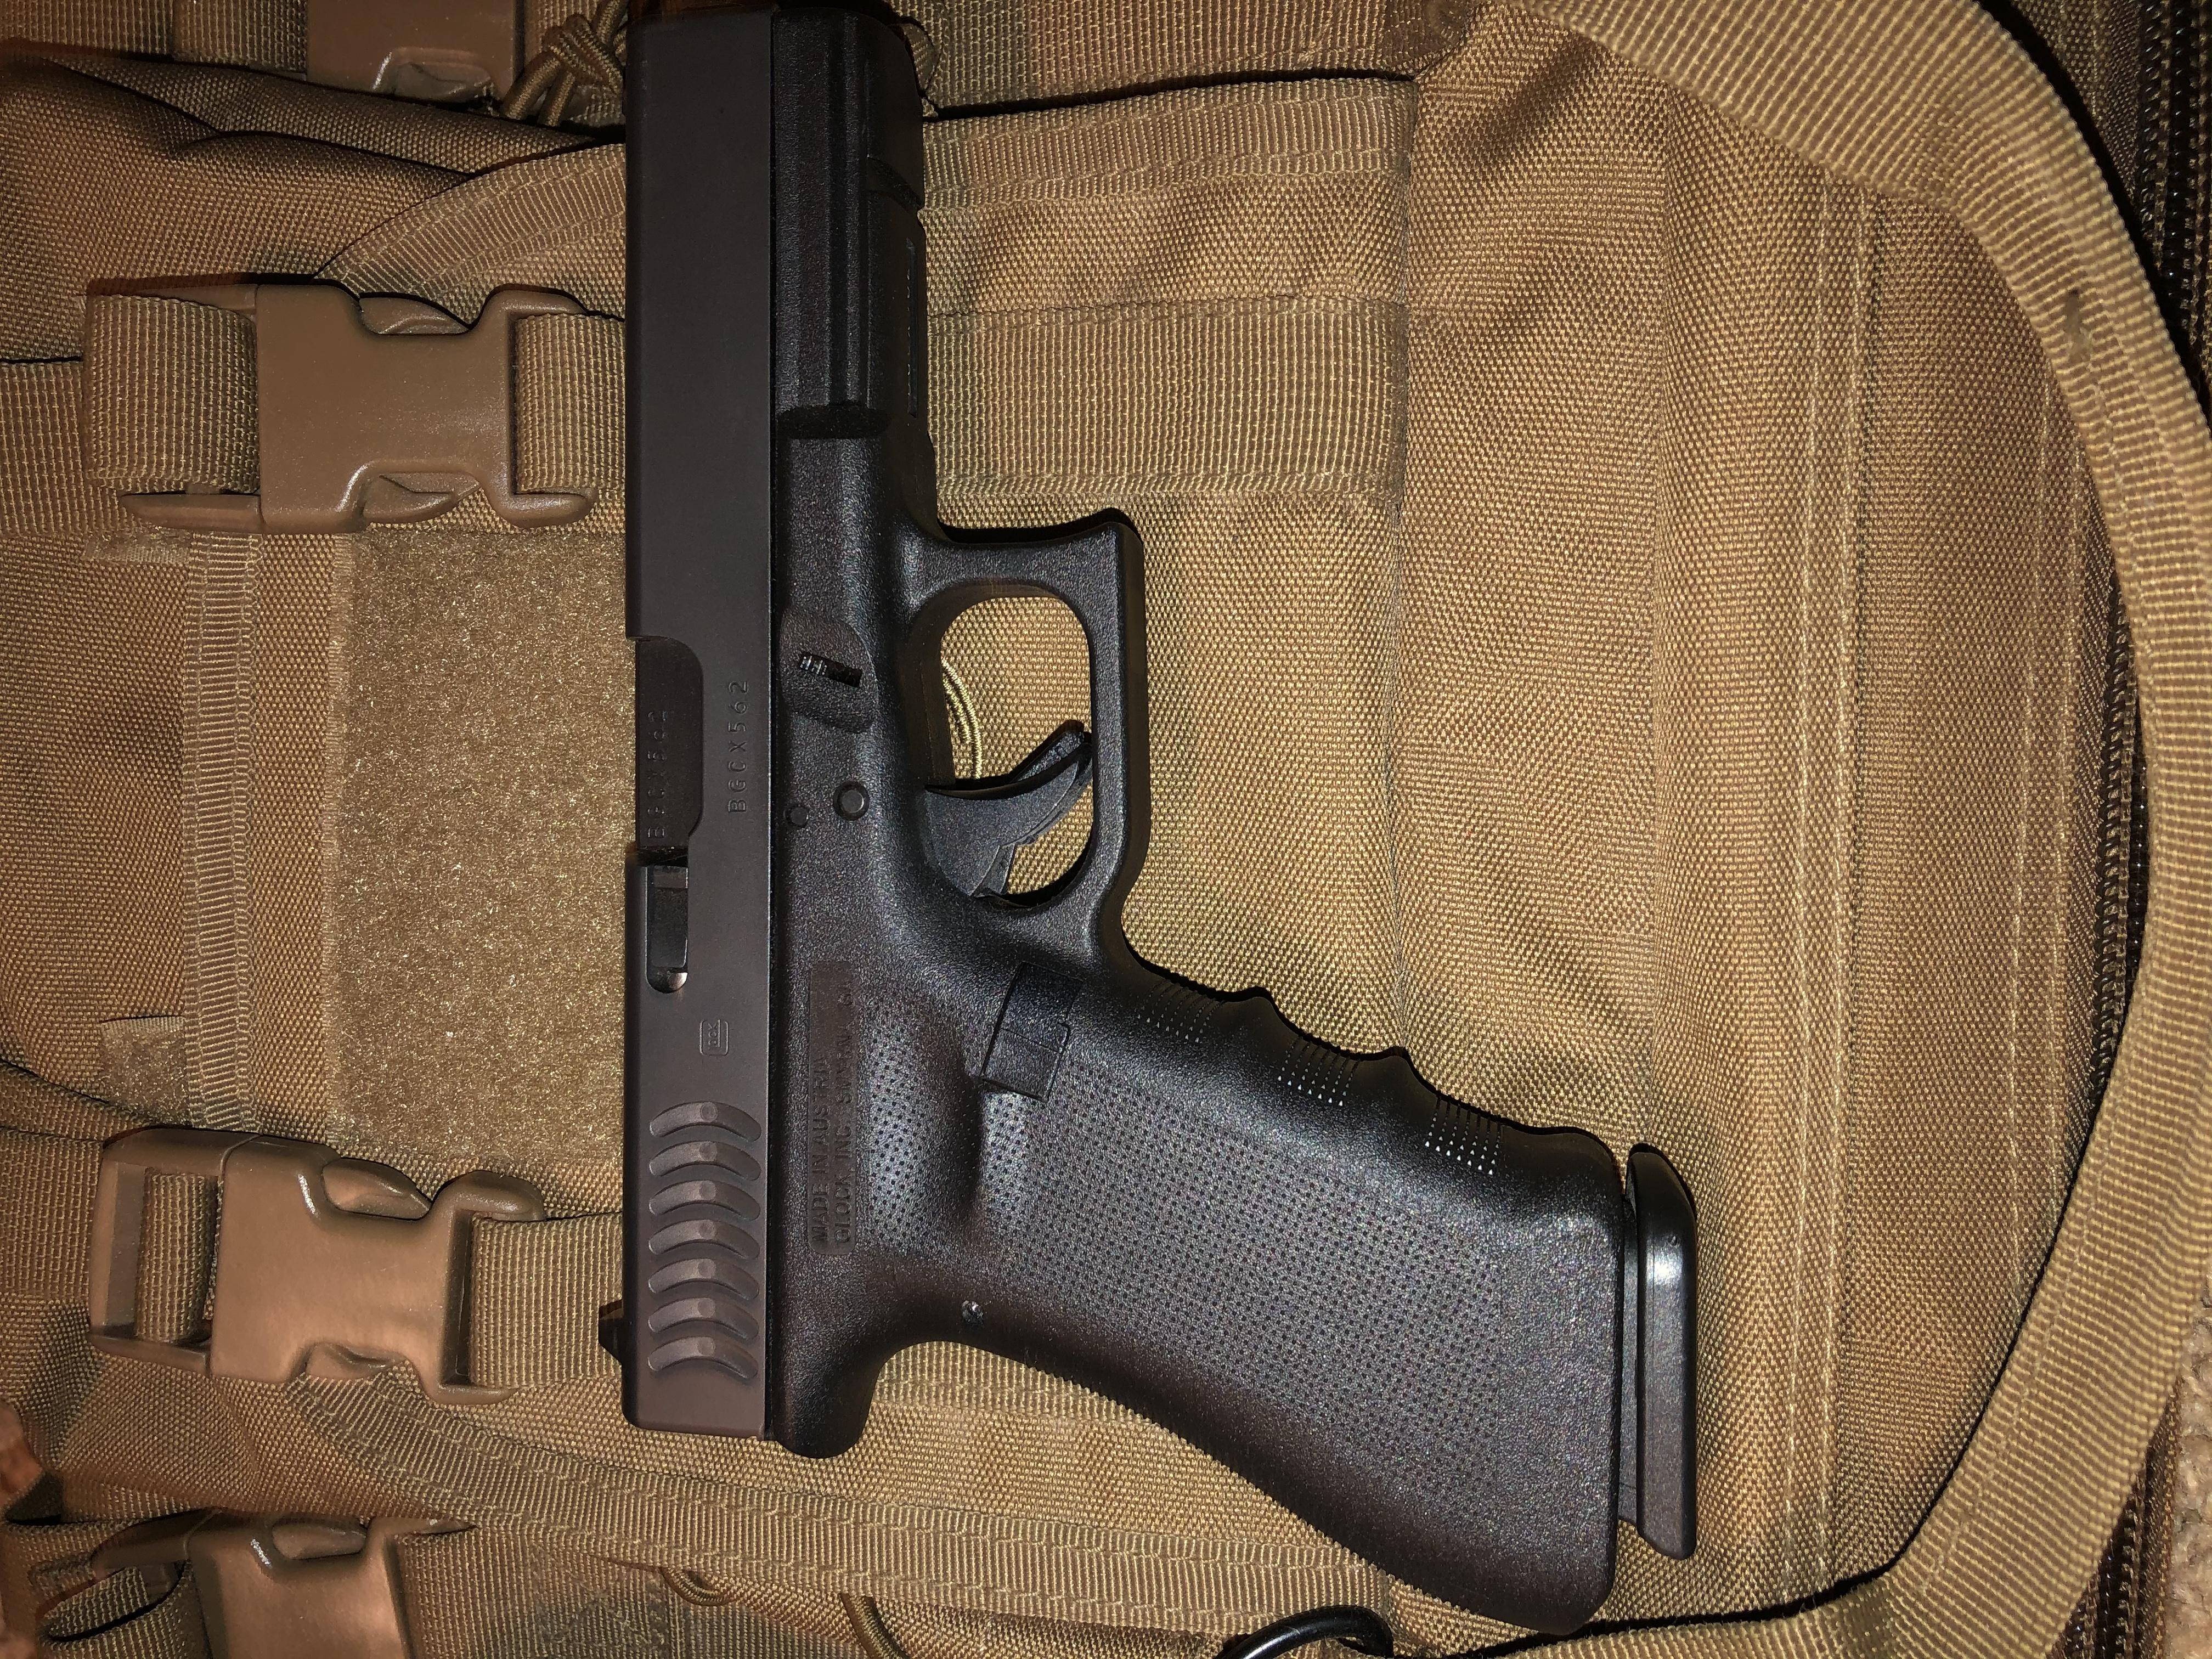 Glock 17 RTF w/ Fish Gills-6bd8b3a1-3a07-4e39-a5d2-68d74d898264.jpeg